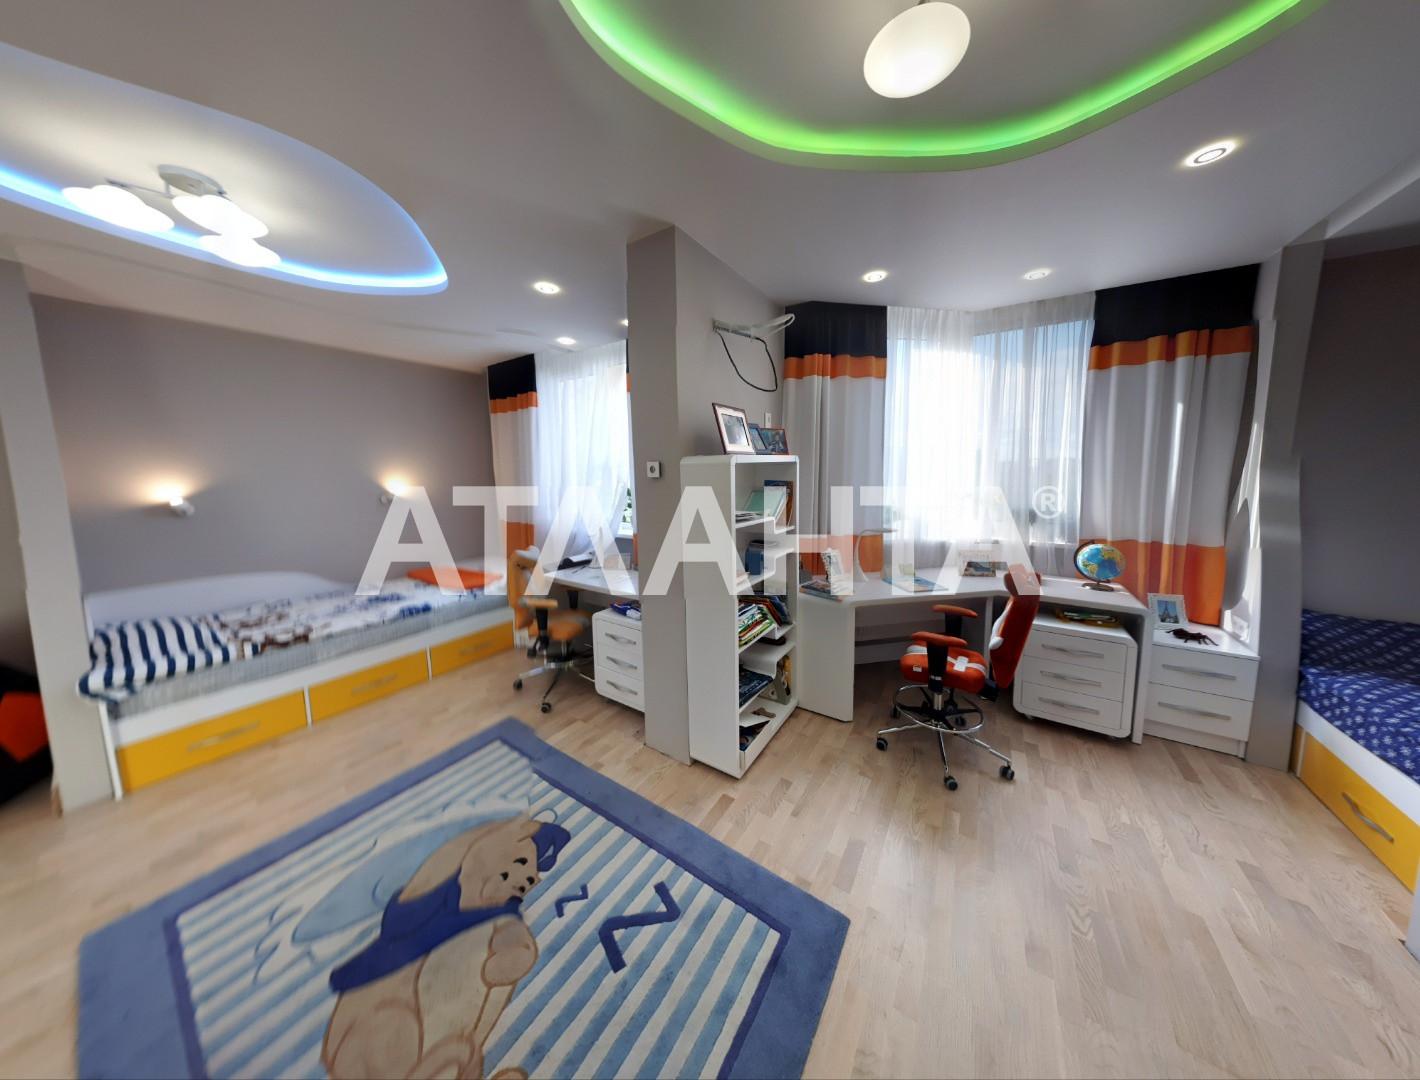 Продается 3-комнатная Квартира на ул. Ул. Ломоносова — 230 000 у.е. (фото №10)